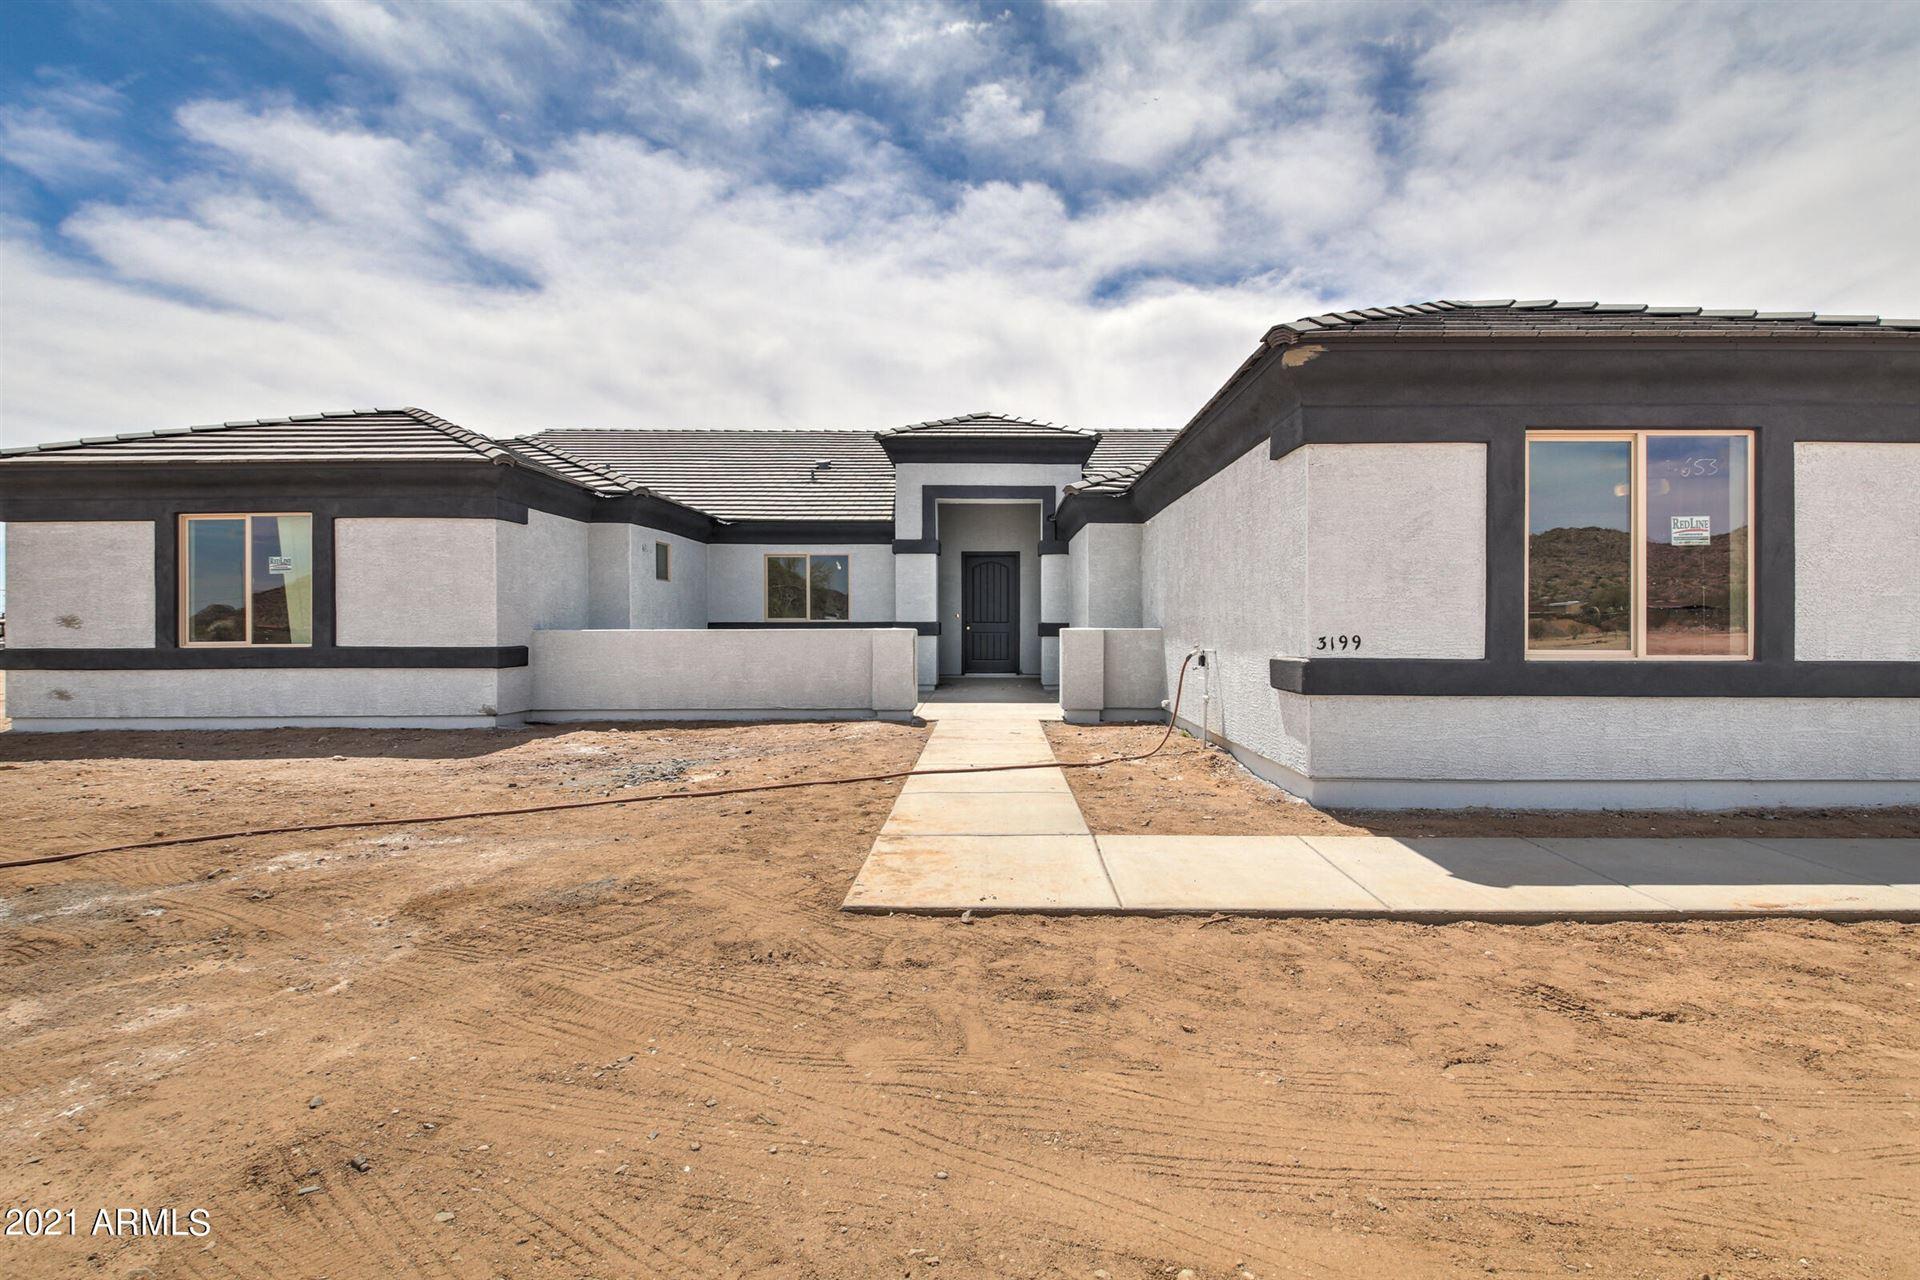 1276 W LOMA DE ORO --, Queen Creek, AZ 85142 - MLS#: 6196491